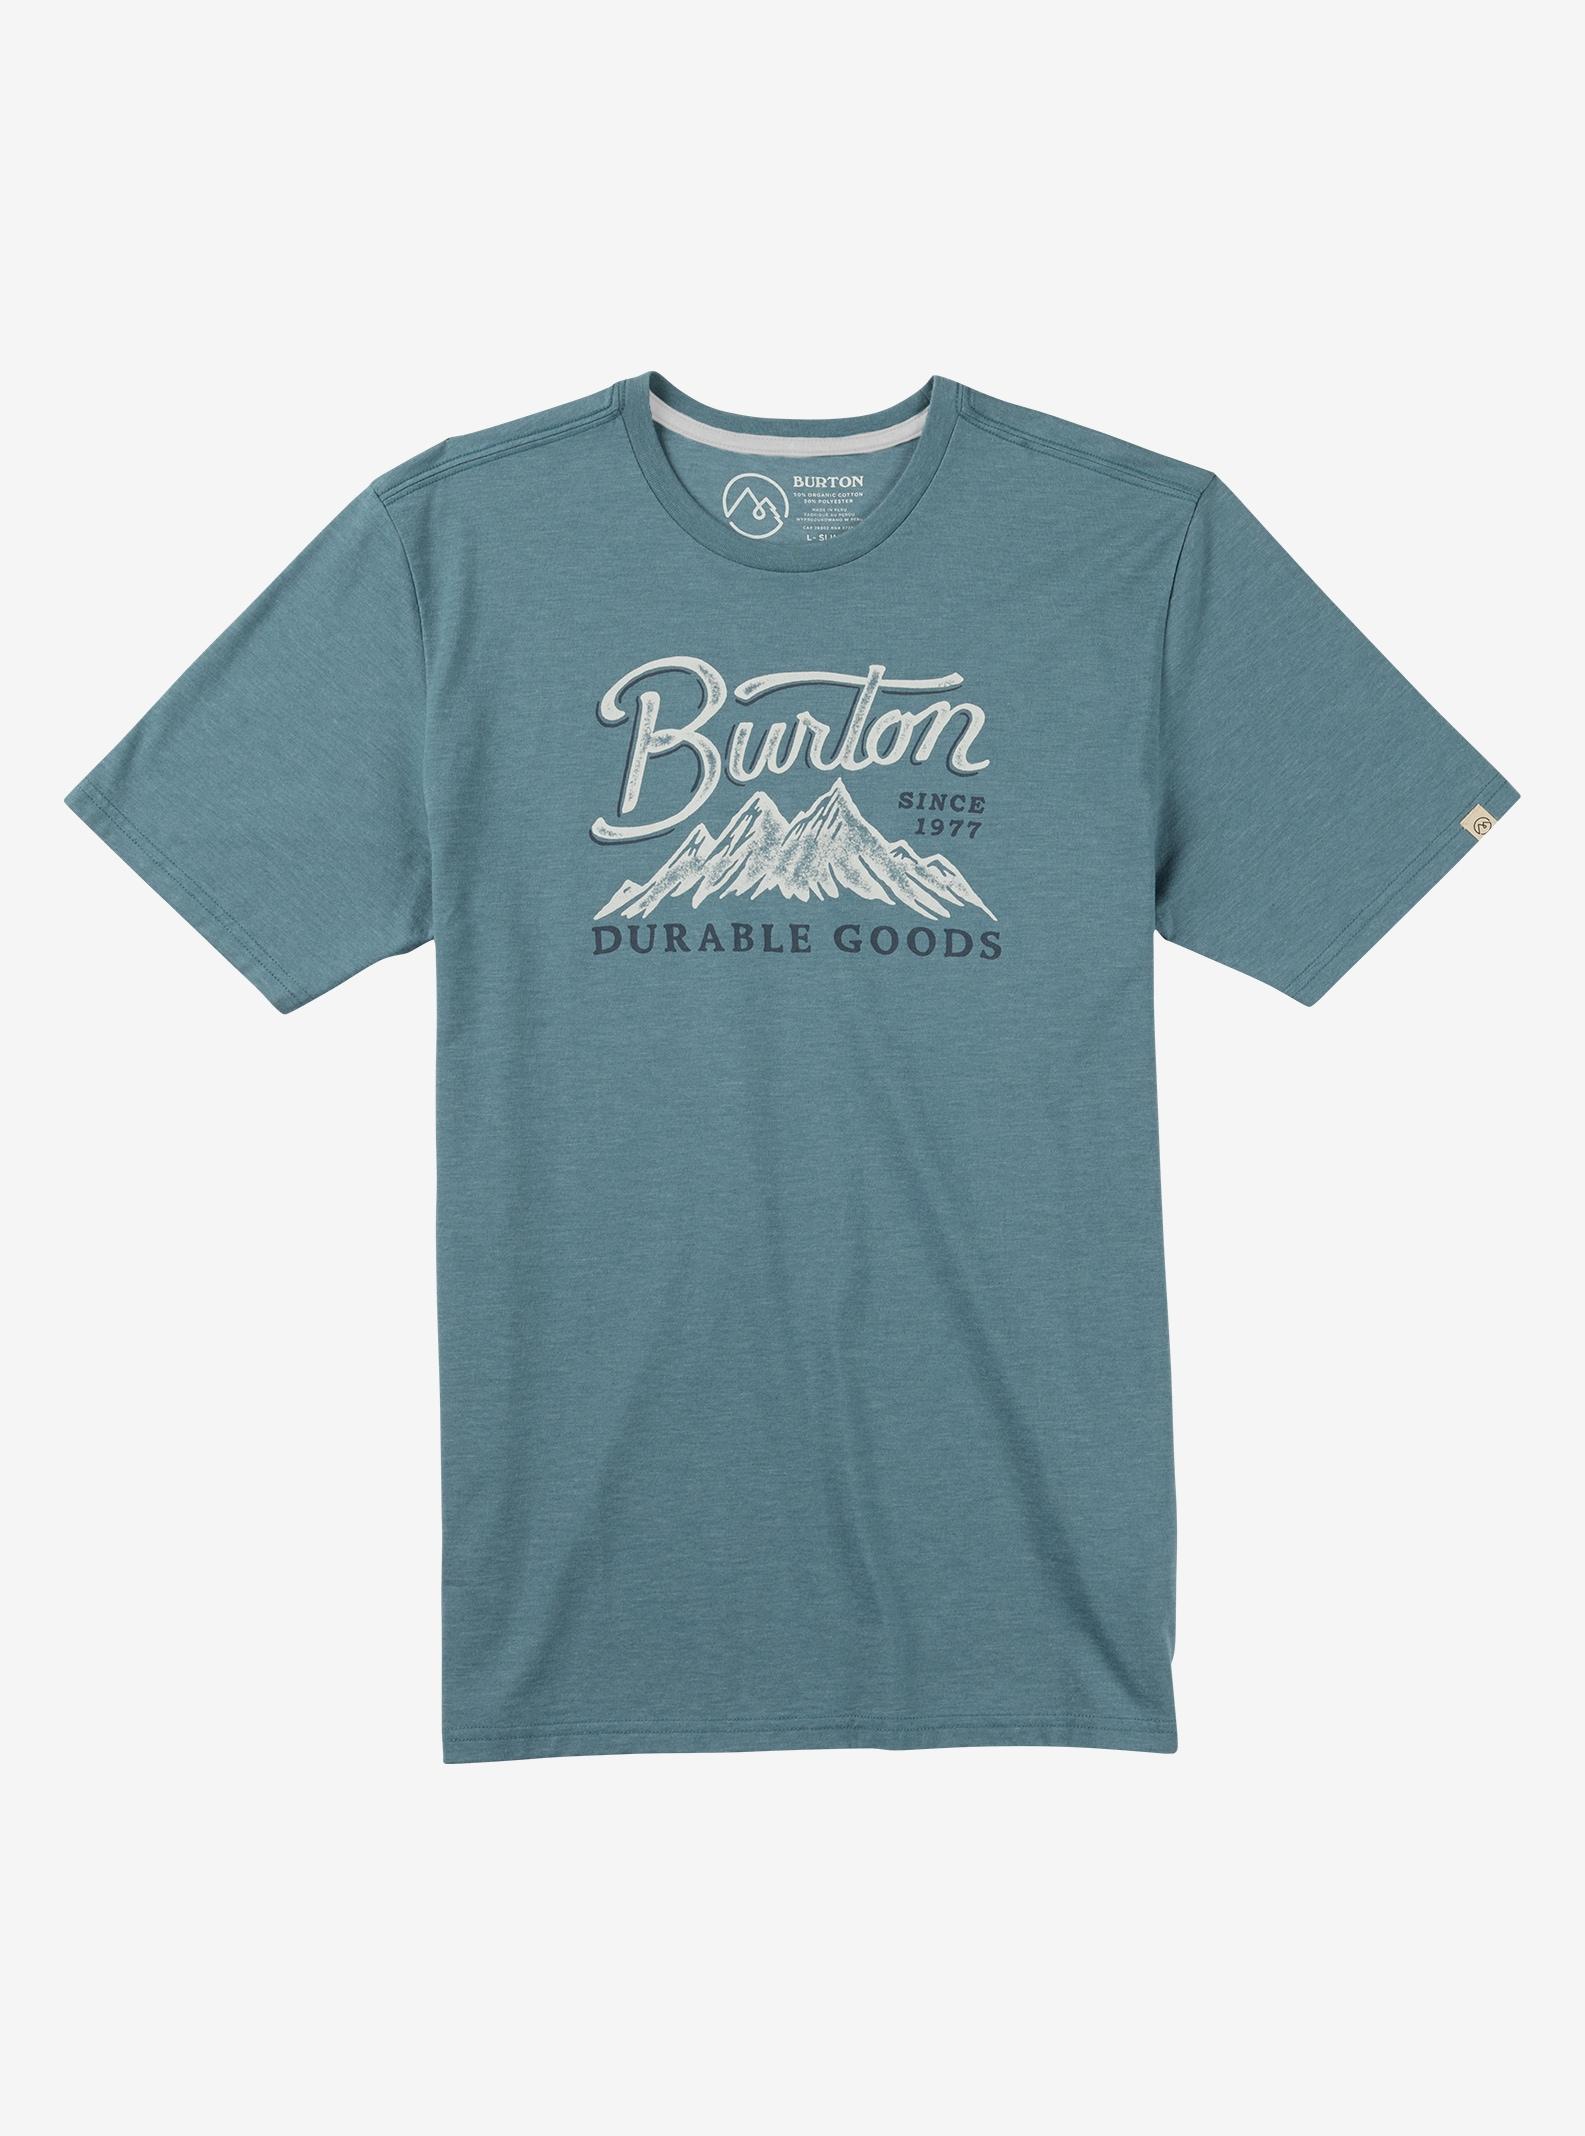 Burton Front Range Short Sleeve T Shirt shown in Light Indigo Heather